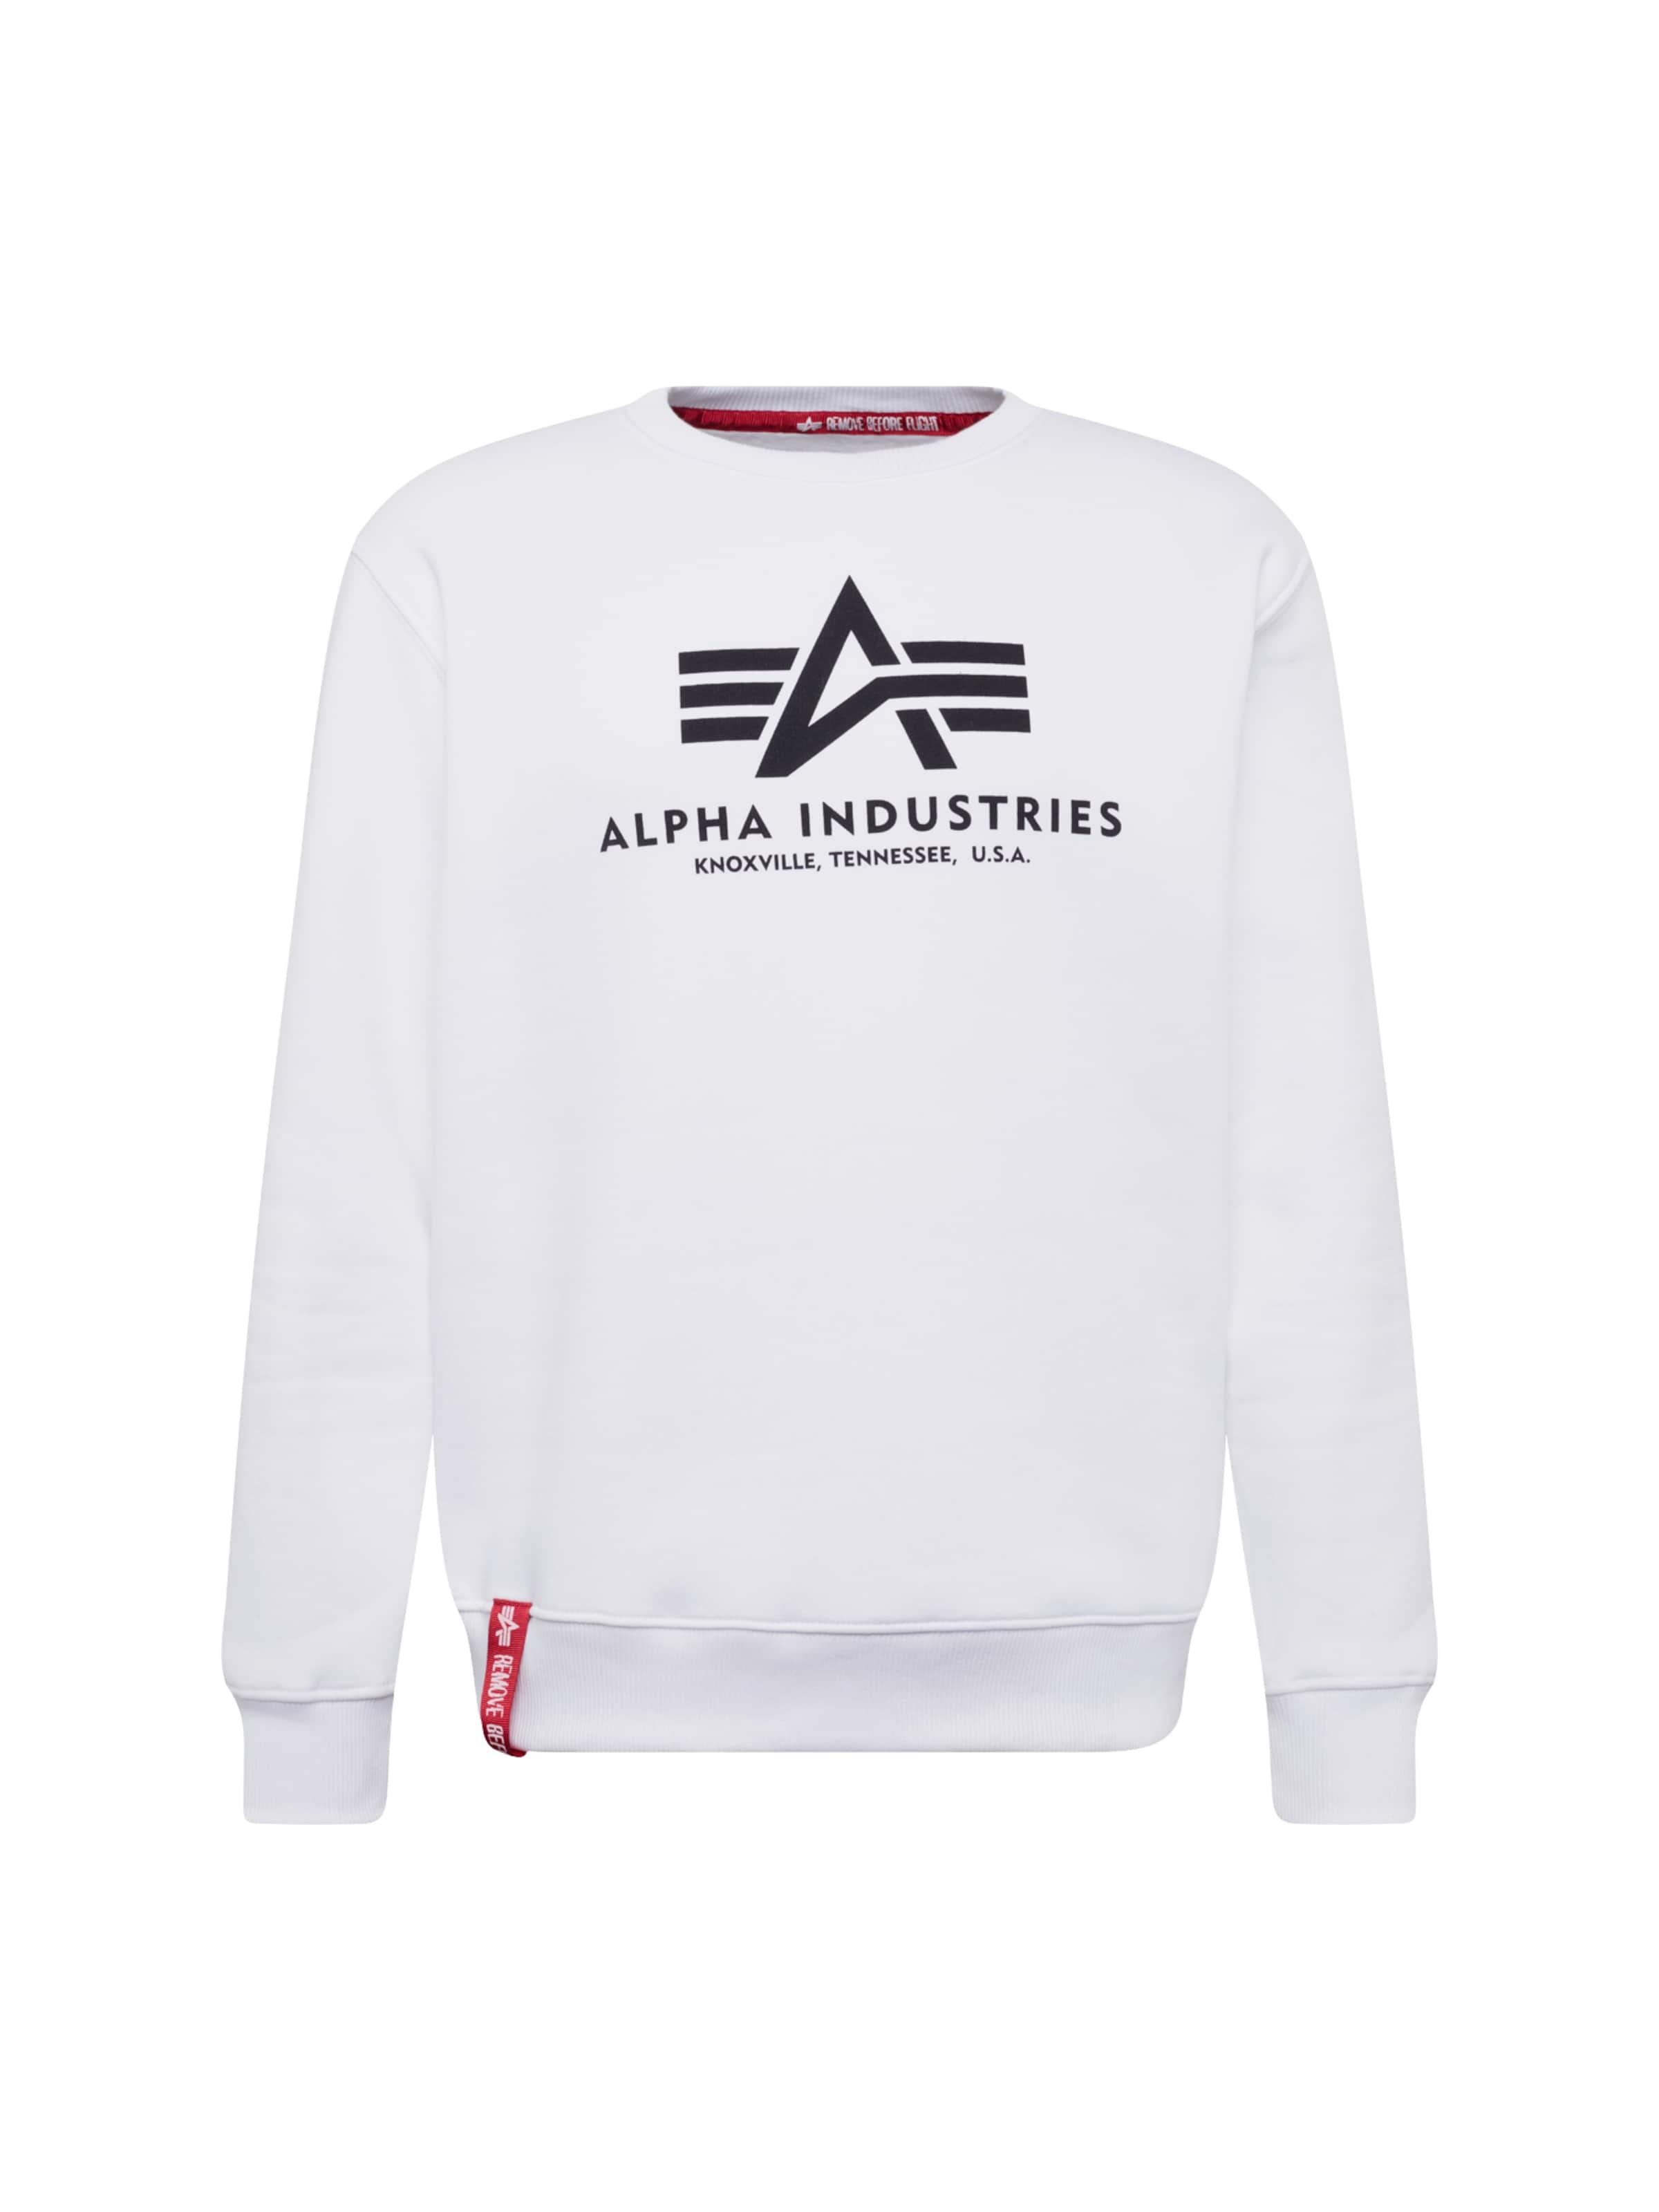 Alpha Industries Blanc shirt Sweat En 'basic' P8nOXwk0